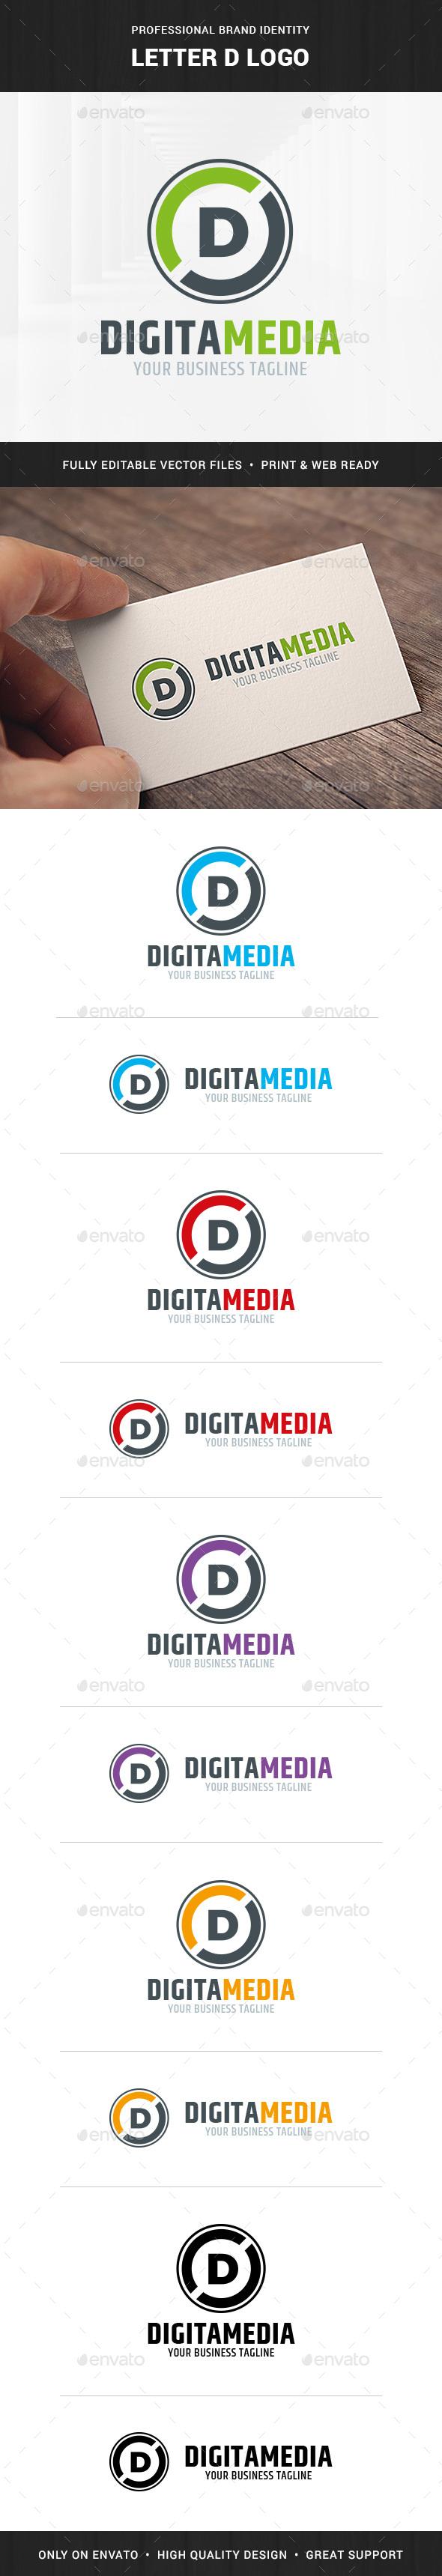 Letter D Logo Template - Letters Logo Templates